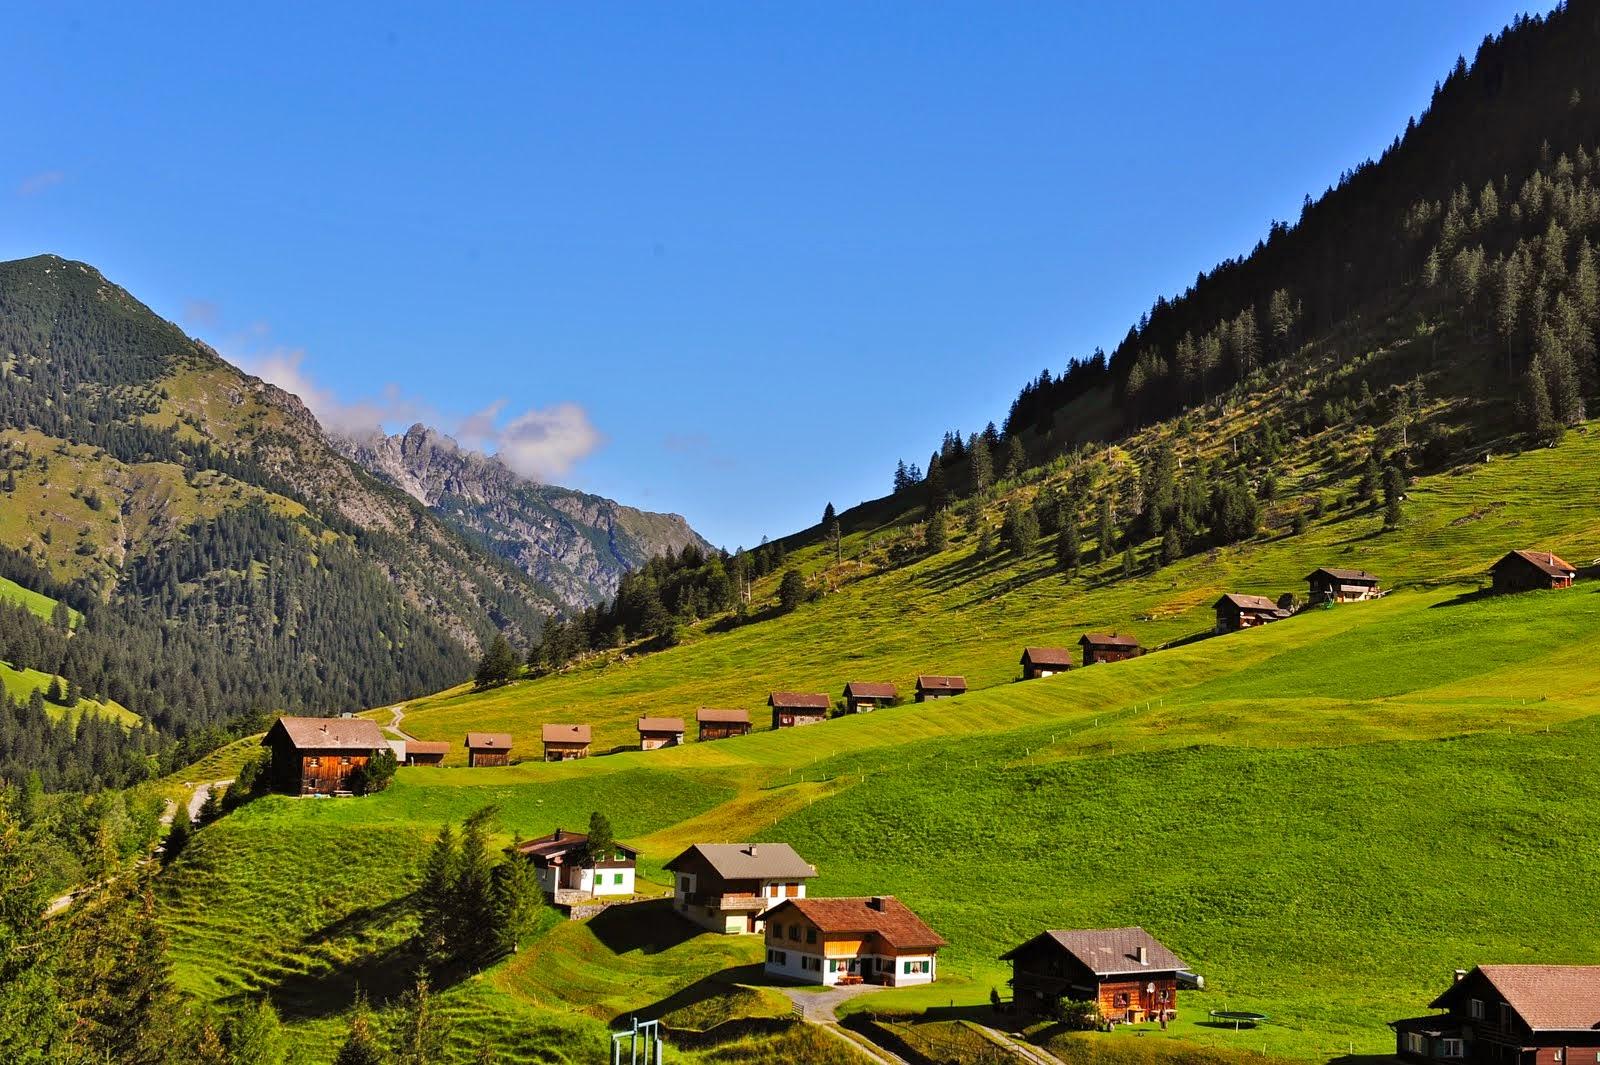 http://www.taringa.net/post/imagenes/17840564/Esto-es-Liechtenstein.html